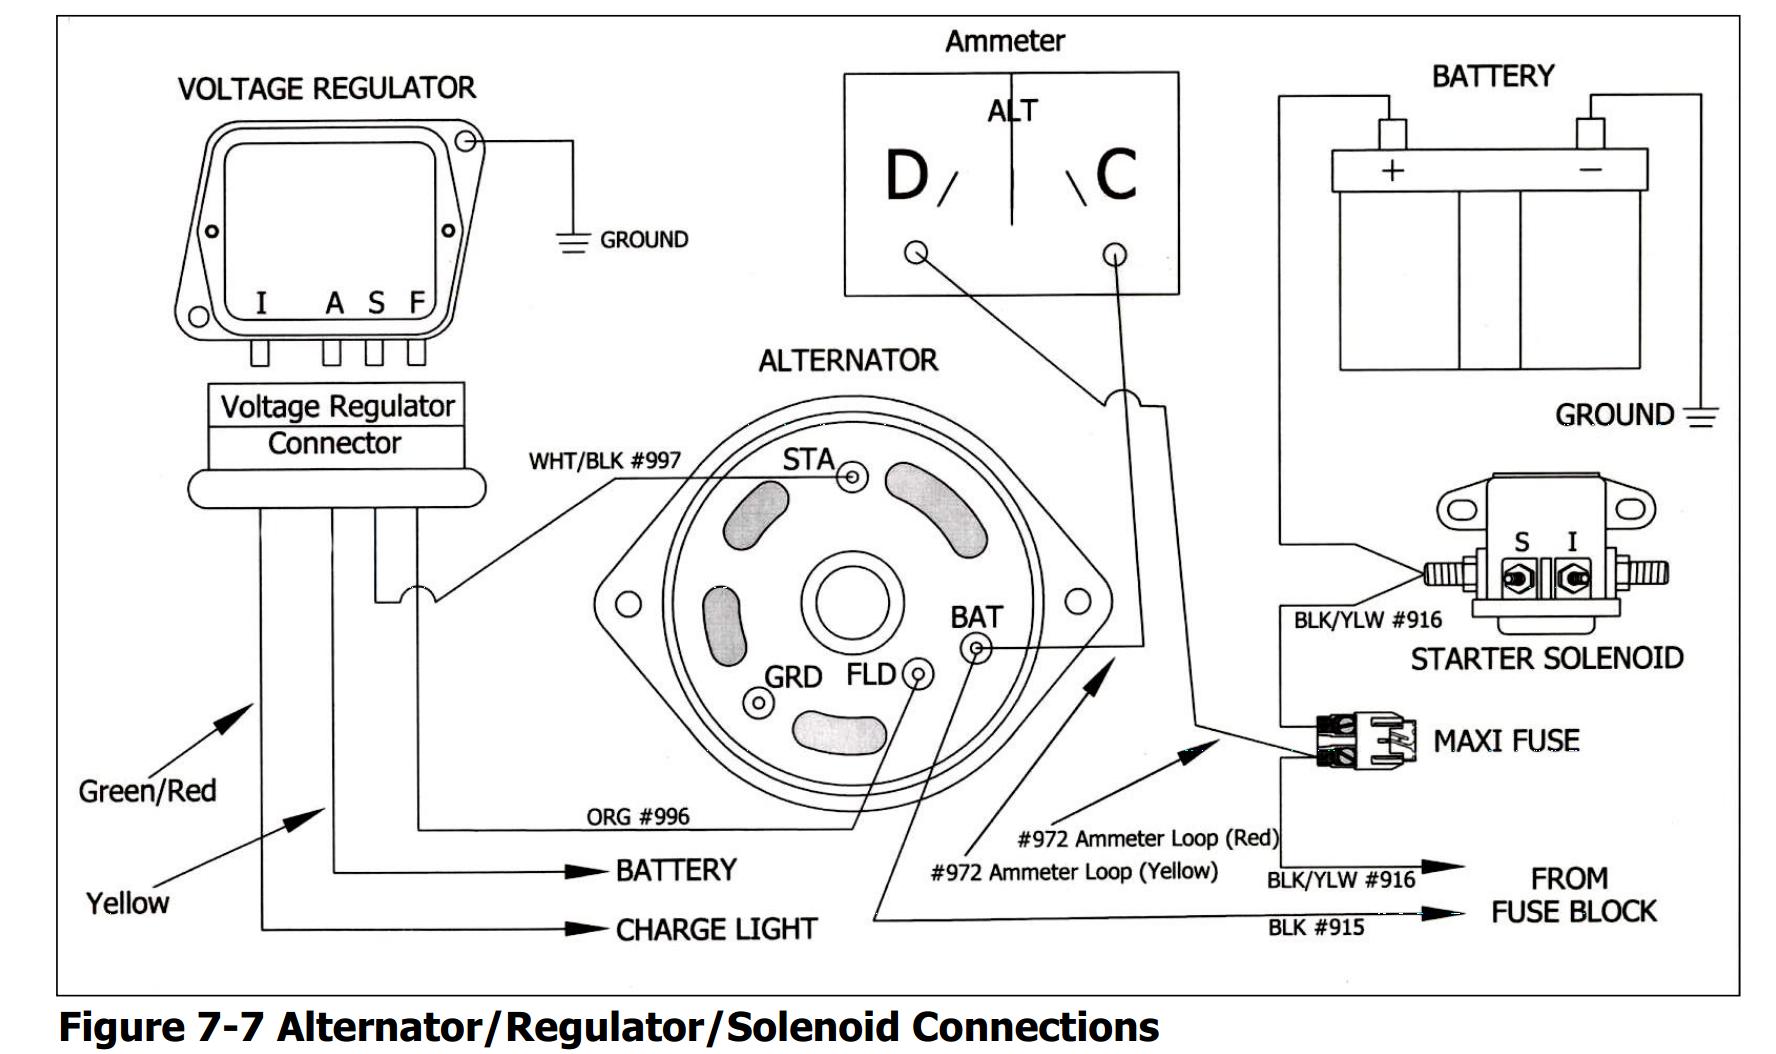 small resolution of vr600 voltage regulator wiring diagram wiring libraryski doo voltage regulator diagram basic guide wiring diagram